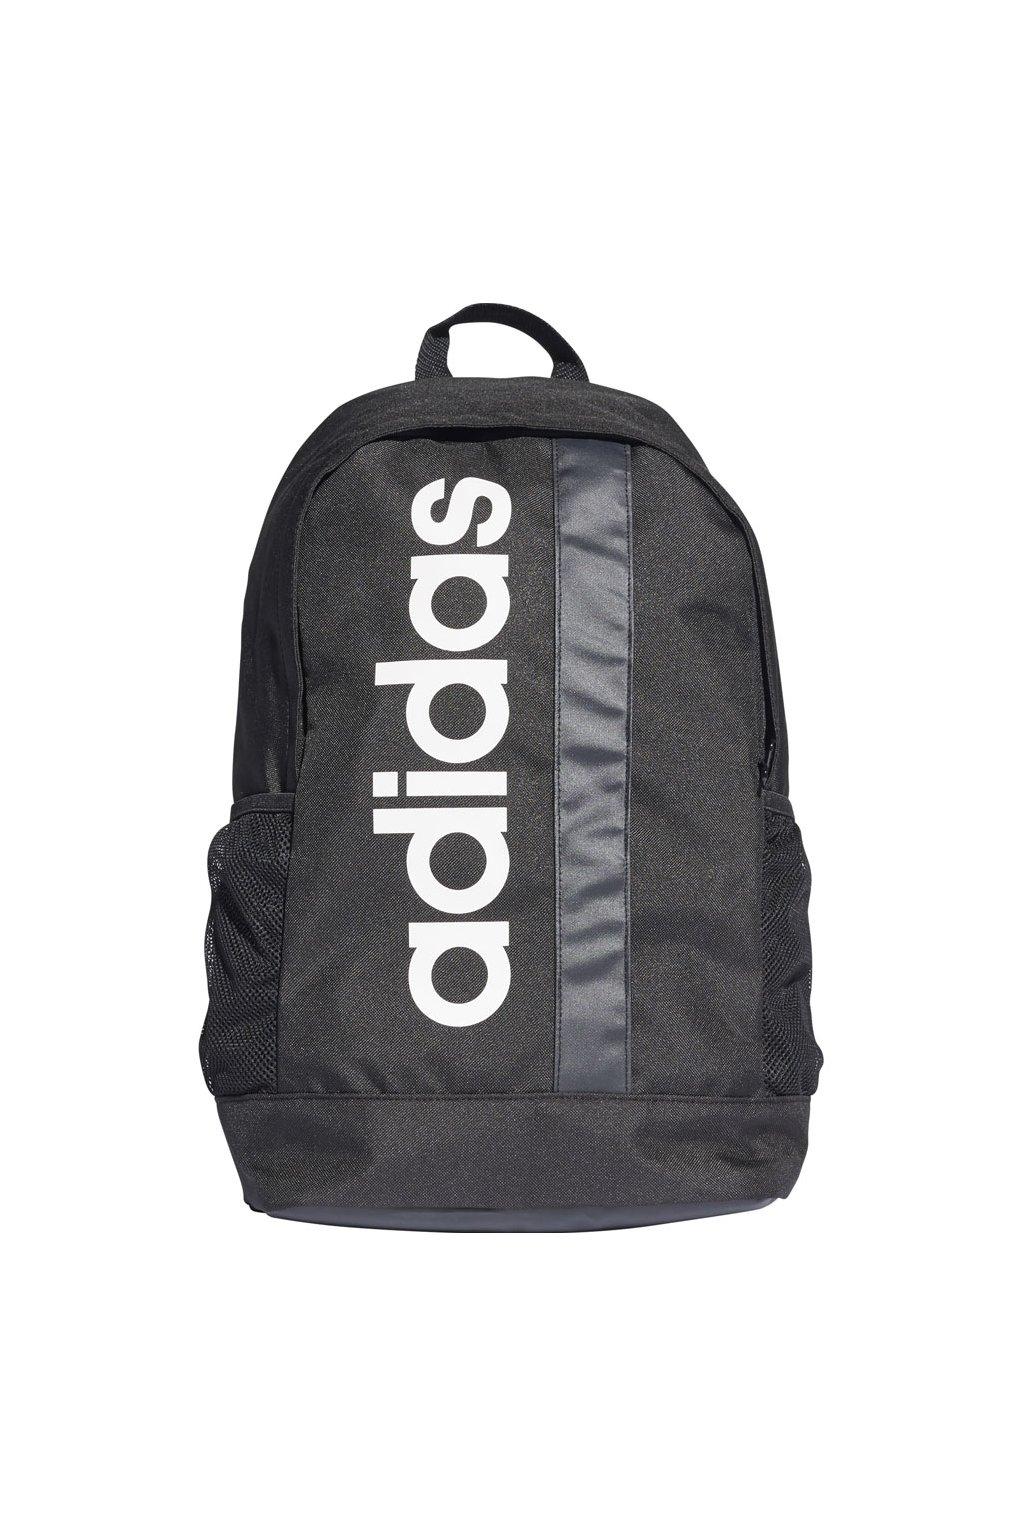 Batoh Adidas Linear Core BP čierny DT4825